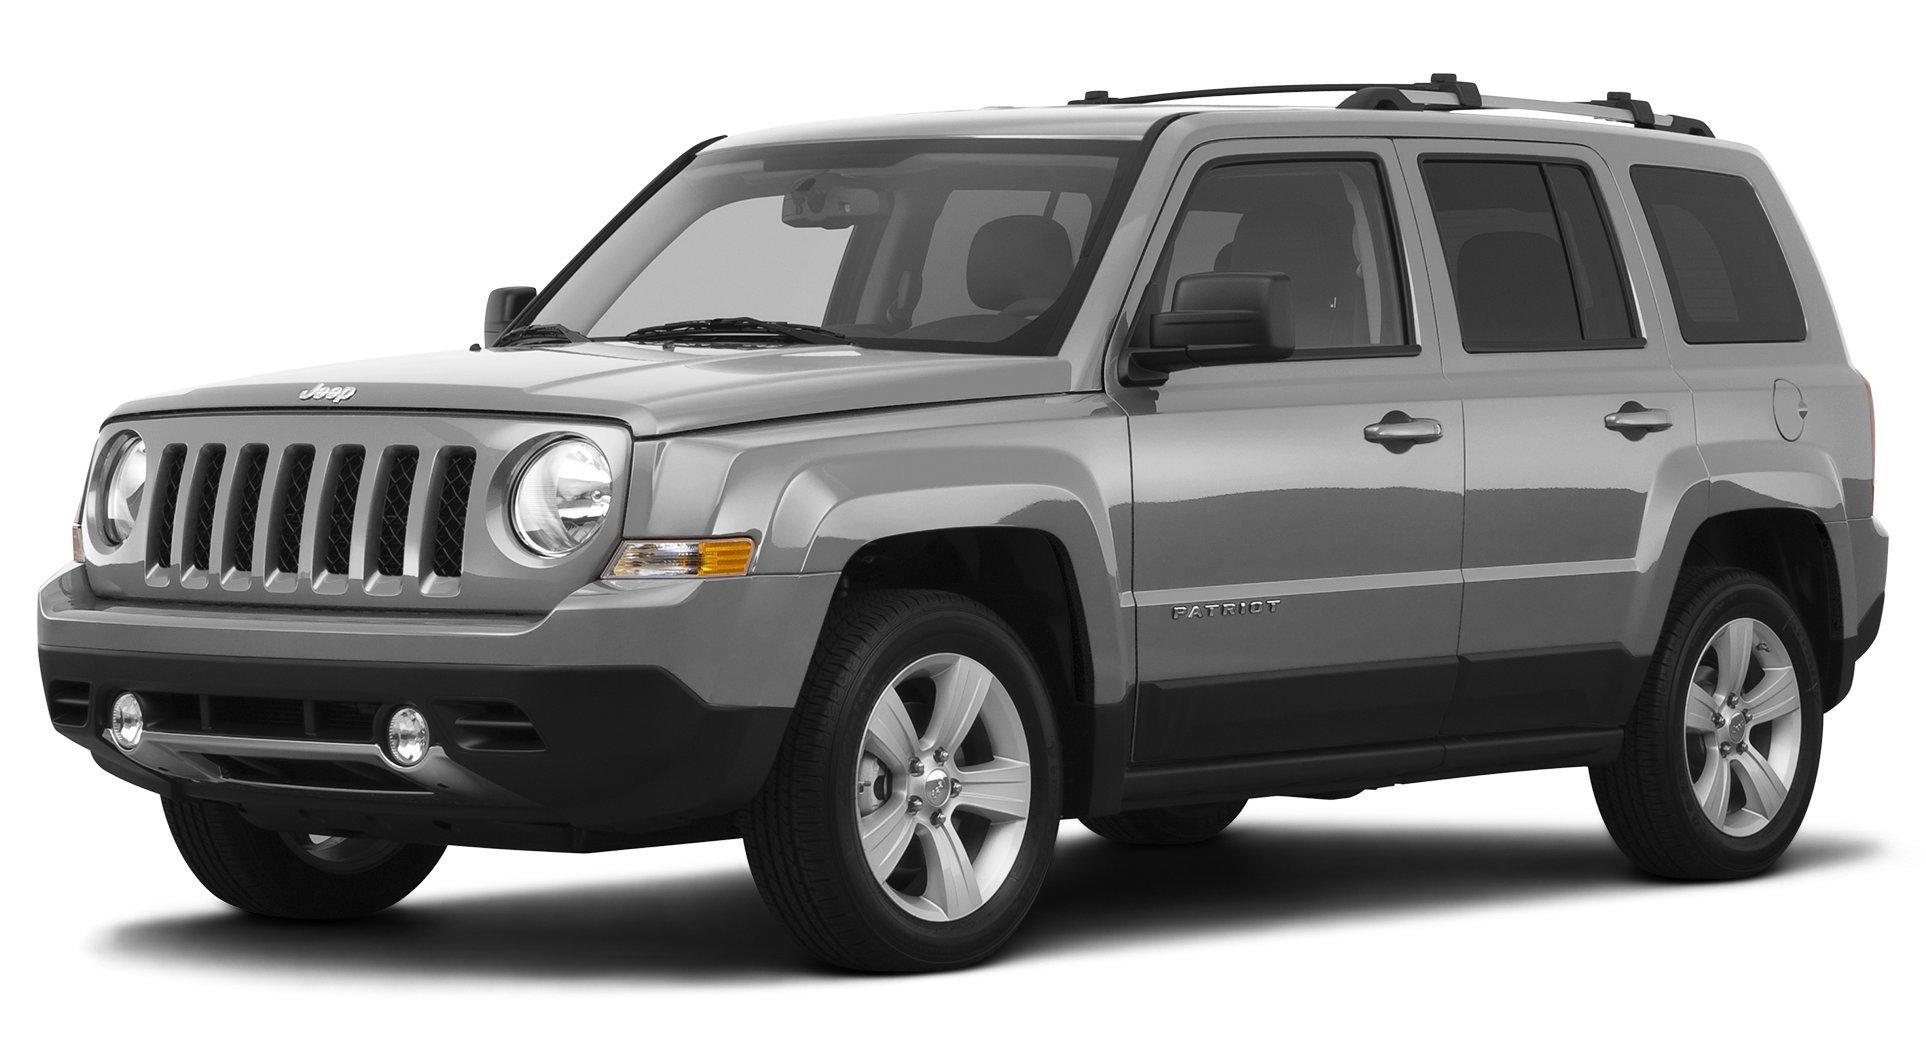 2011 Jeep Patriot 70th Anniversary, 4-Wheel Drive 4-Door ...